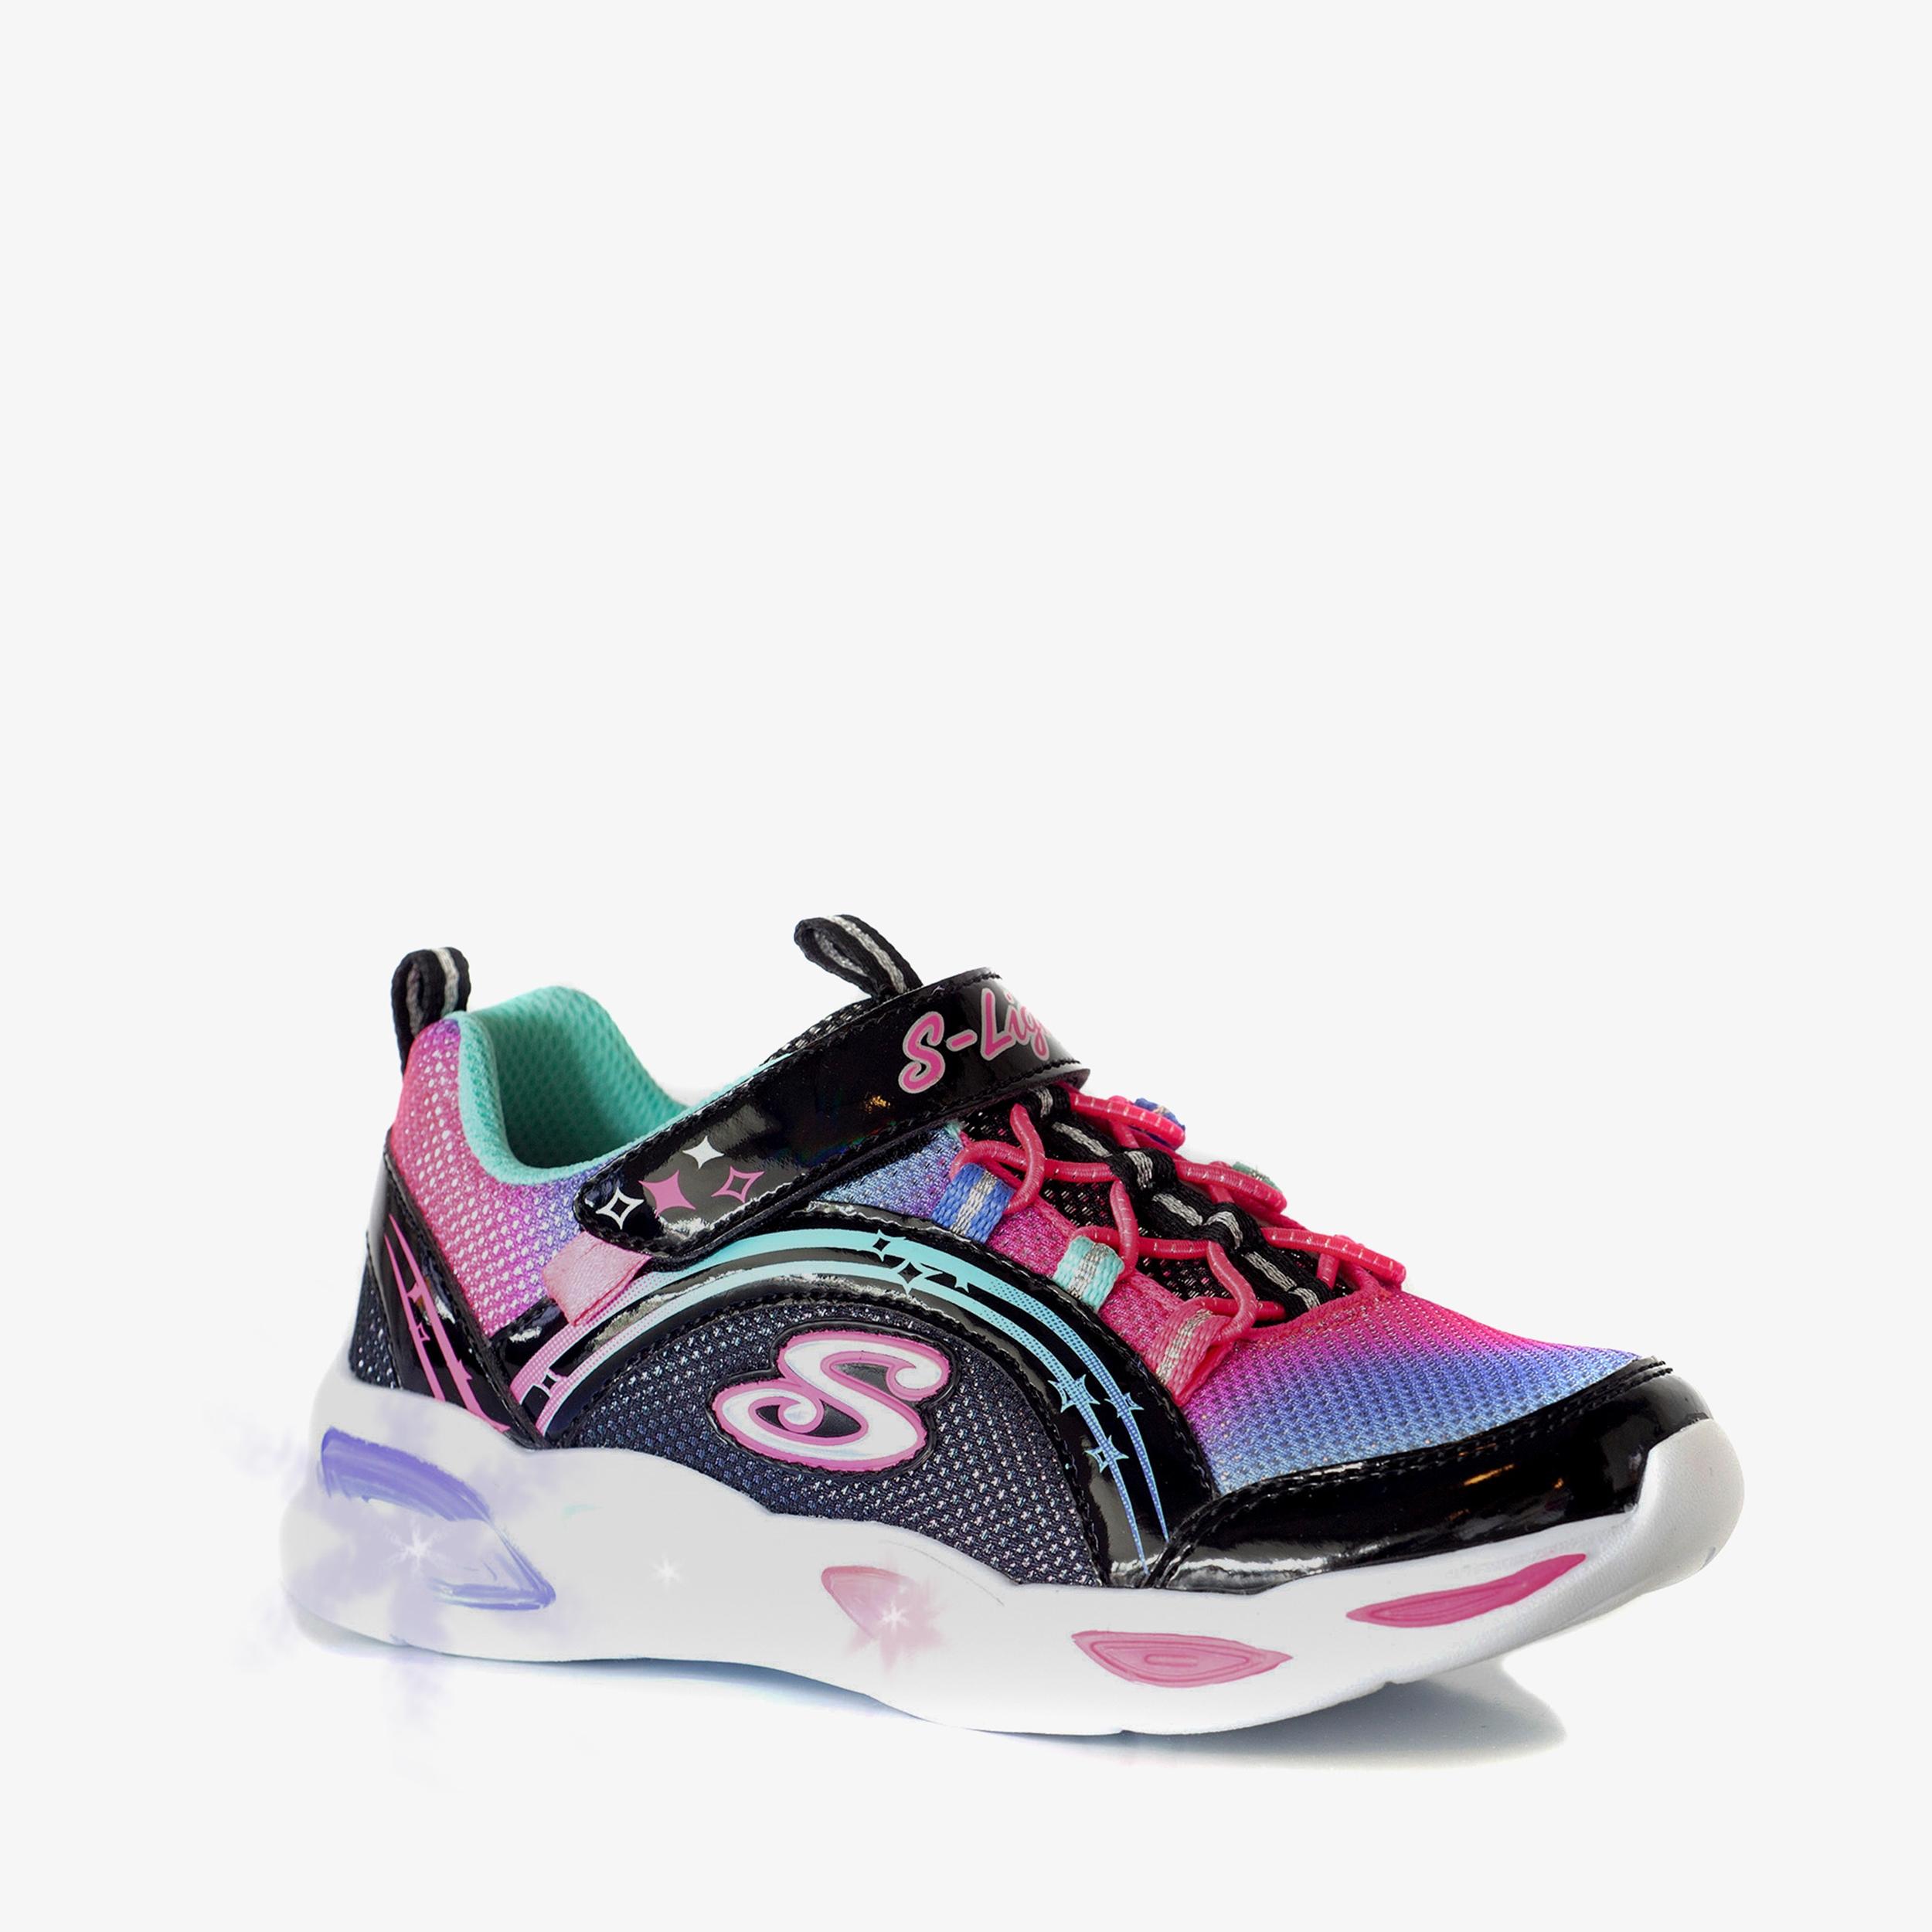 Skechers Shimmer Beams meisjes sneakers | Scapino.nl